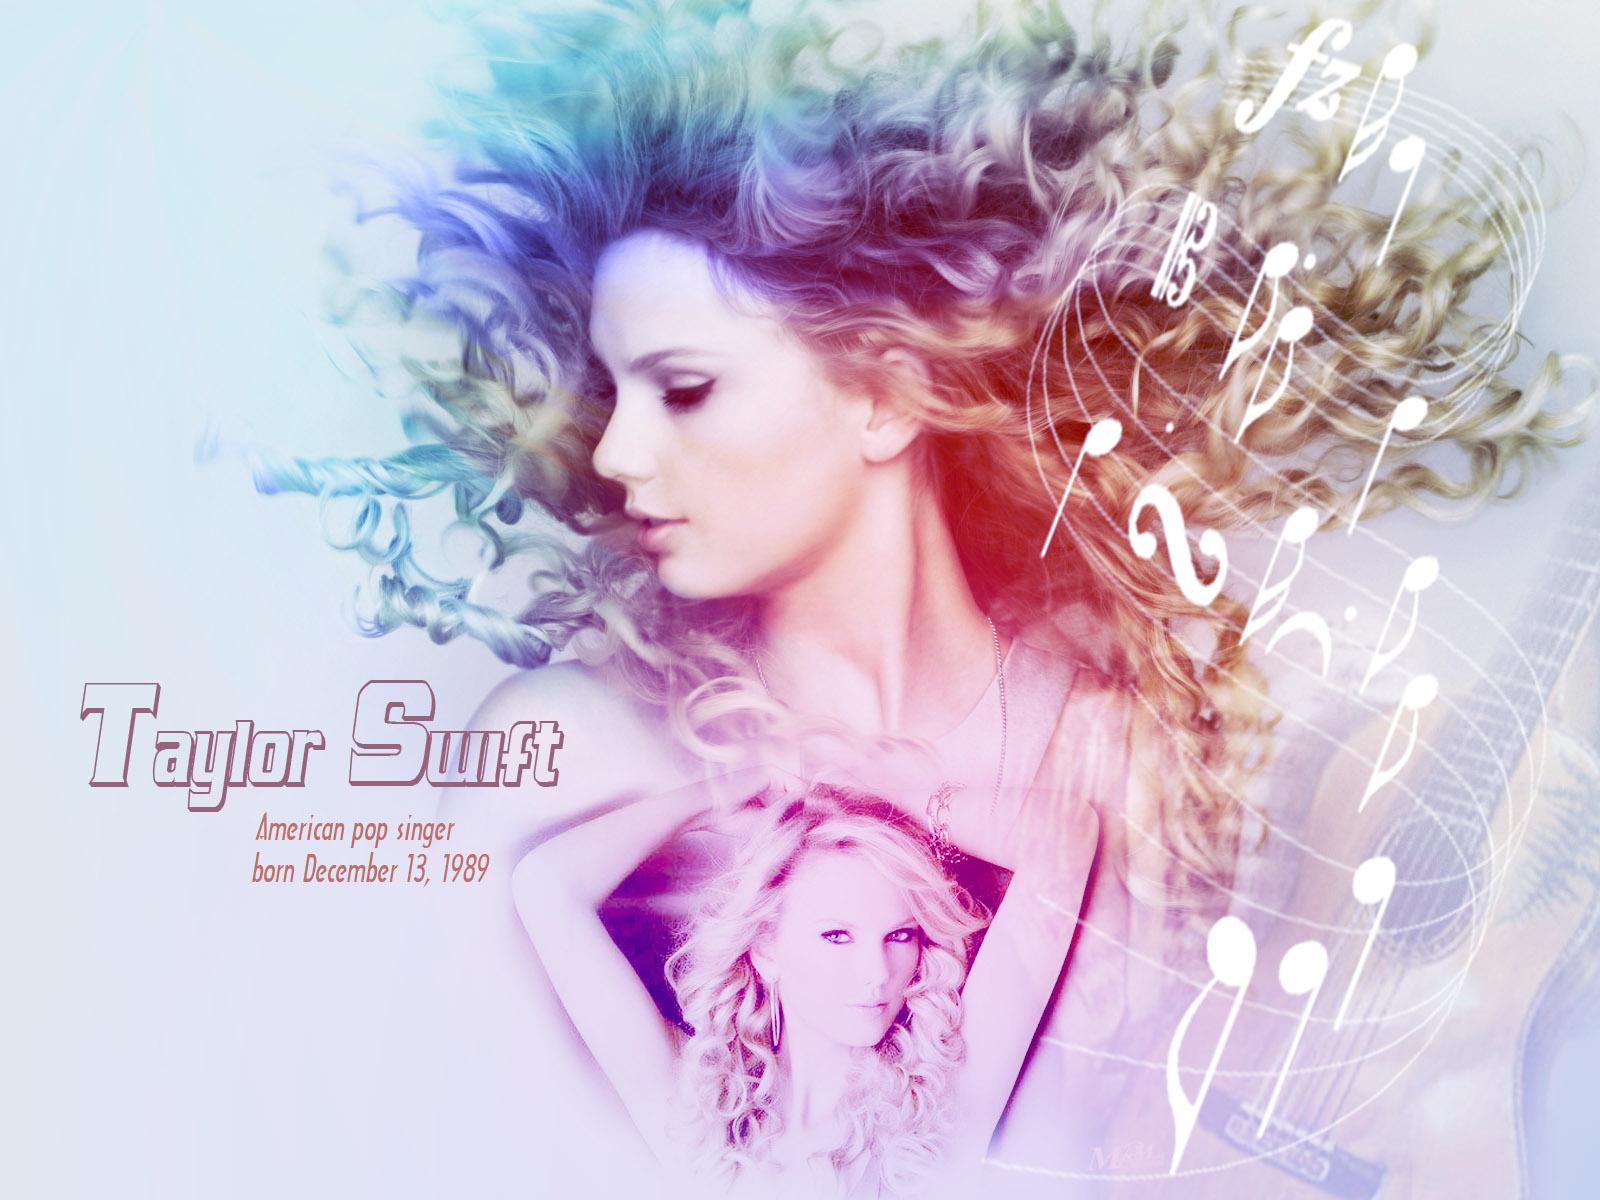 http://4.bp.blogspot.com/-N1qY1FUghBg/TmRlzsnQ-uI/AAAAAAAAFCU/qq6Lk7z5fw0/s1600/Taylor+Swift+Wallpaper+Design+By+mRm.jpg